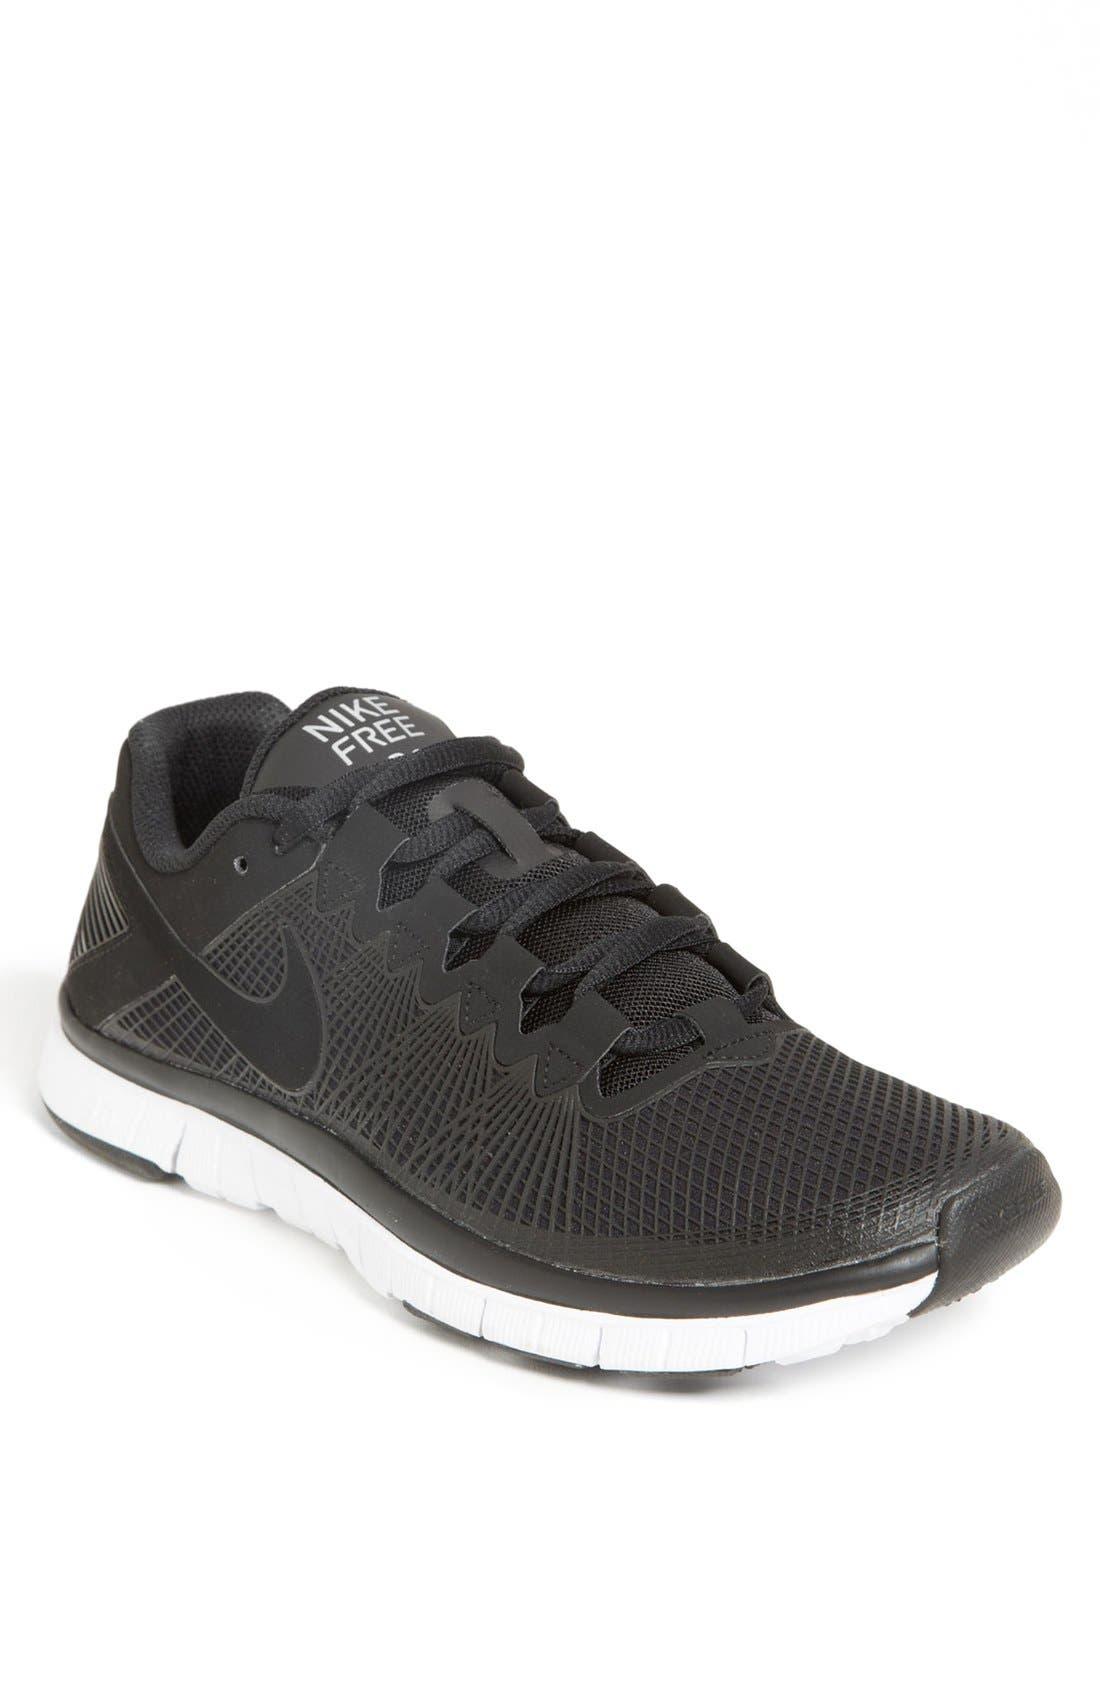 Alternate Image 1 Selected - Nike 'Free Trainer 3.0' Training Shoe (Men)